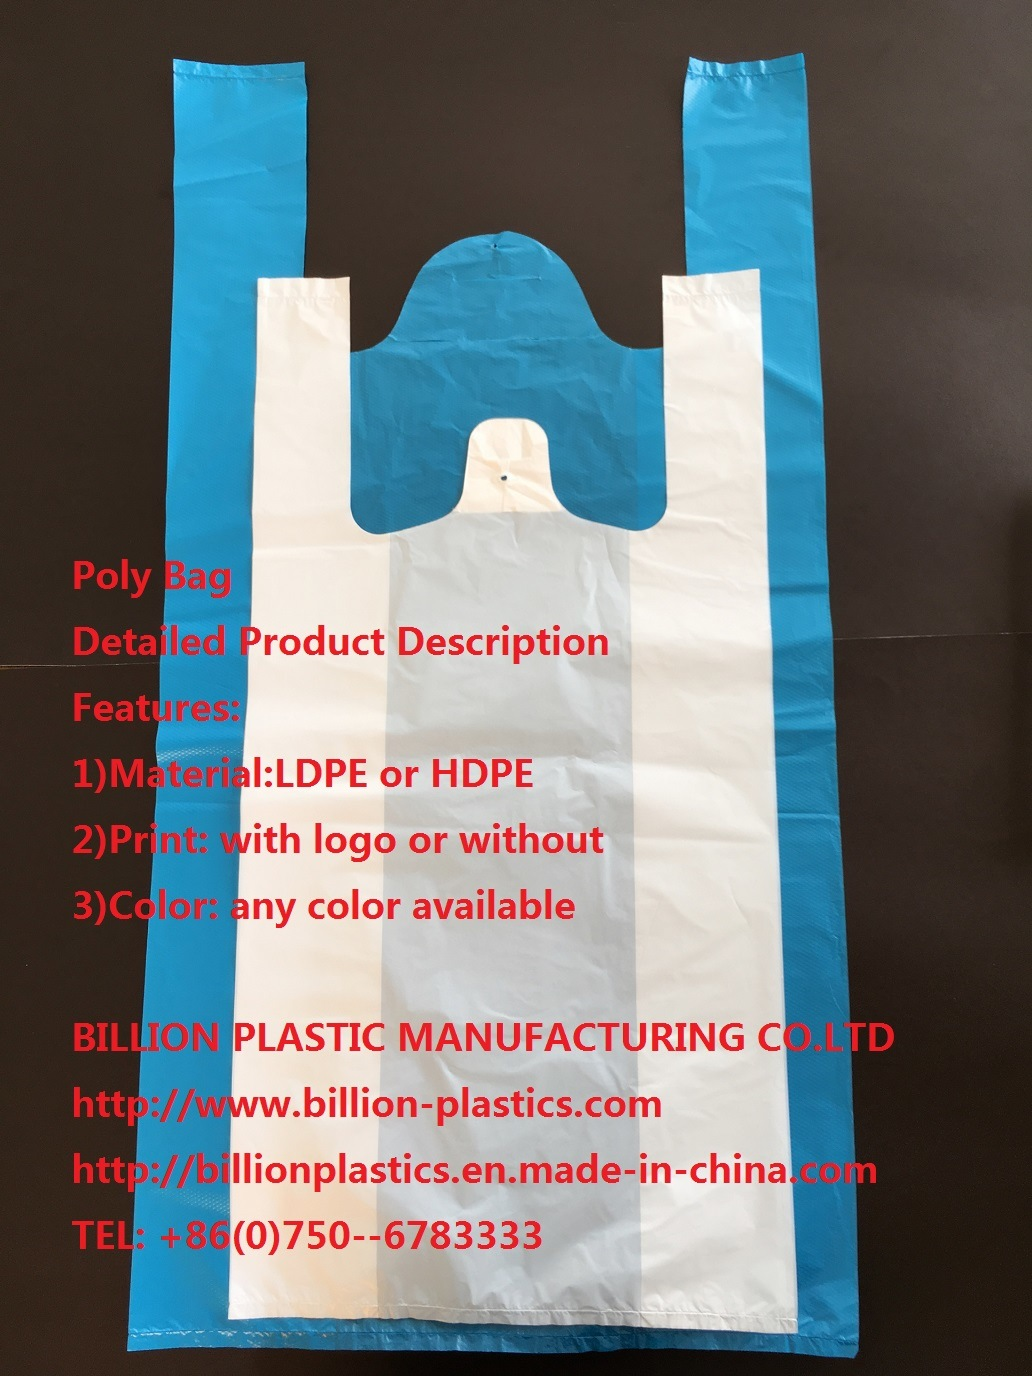 HDPE Plastic T-Shirt Bag Vest Bag Garbage Bag Rubbish Bag T-Shirt Bag Carrier Bag Shopping Bag Polybag Gusset Bag